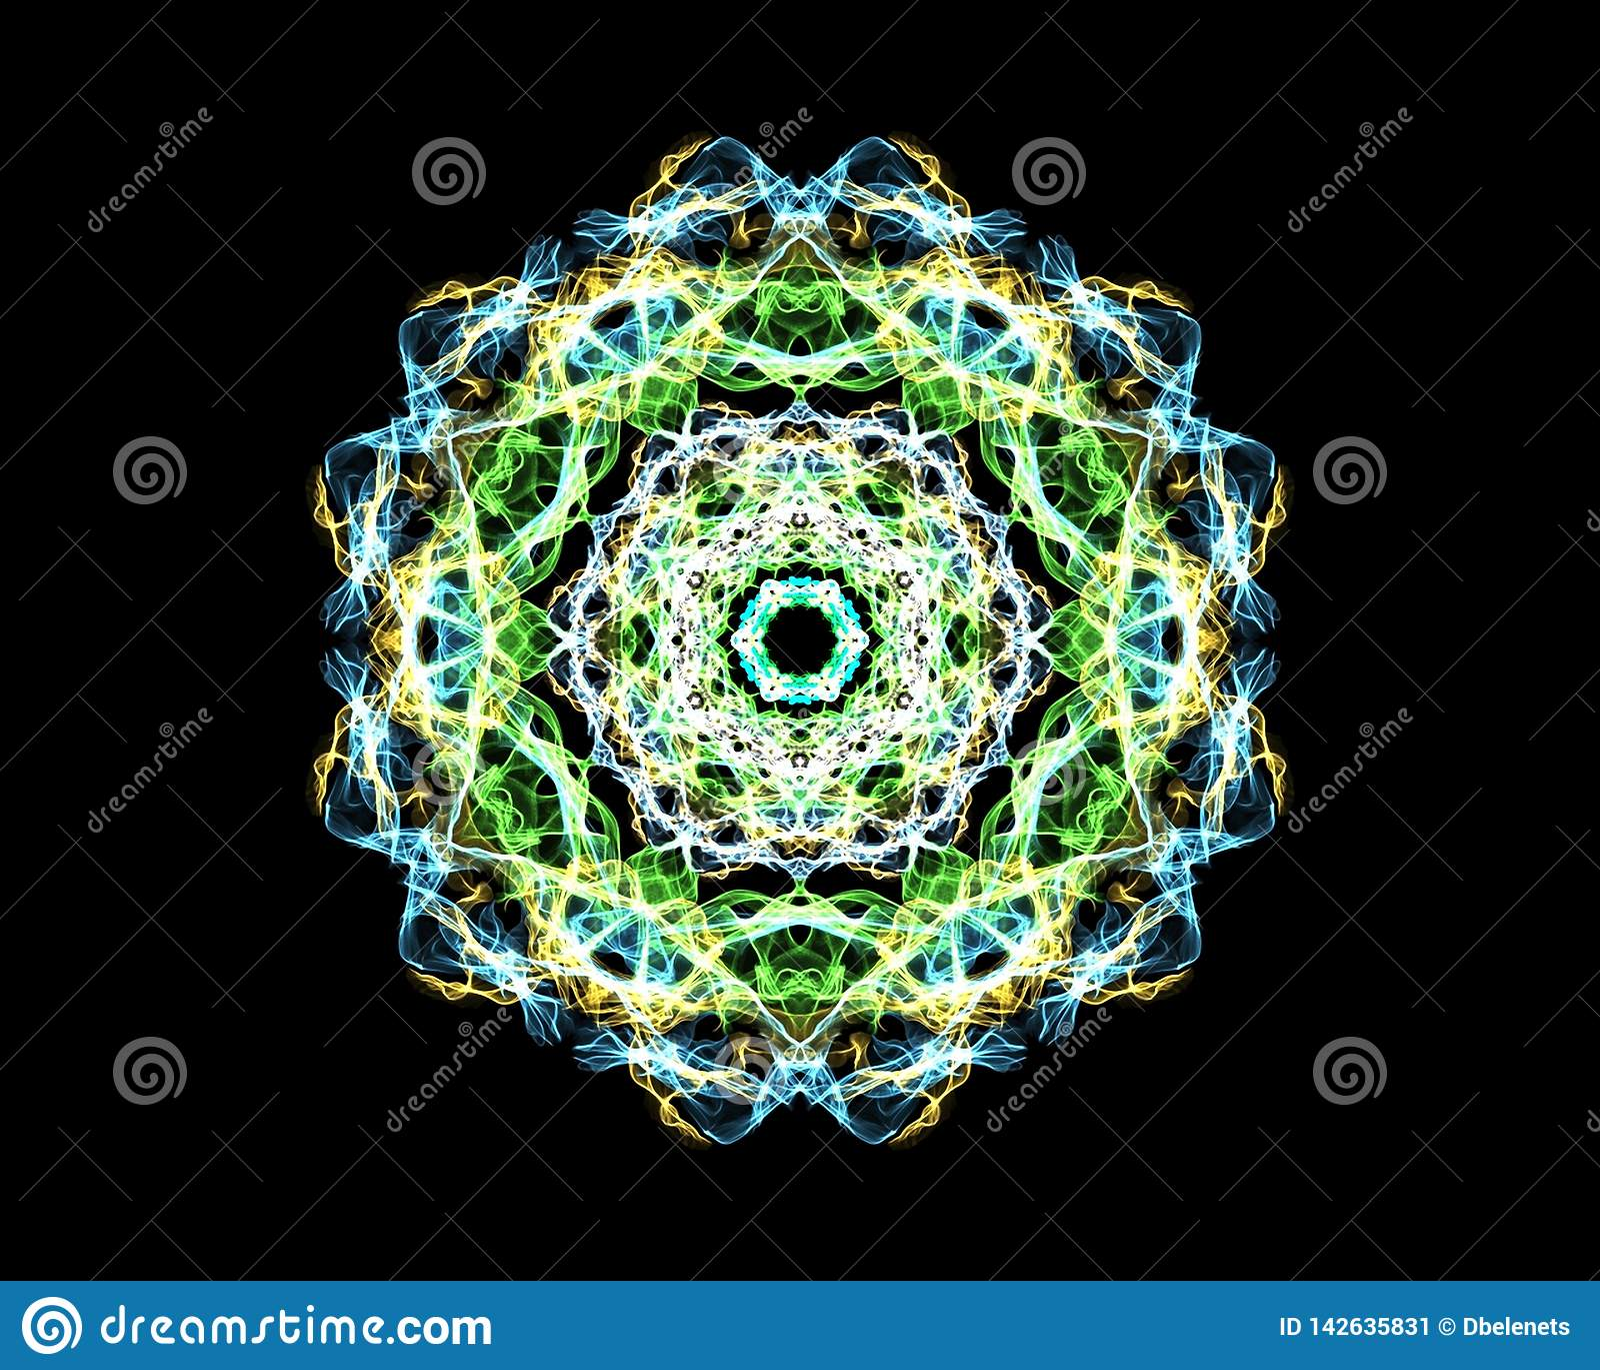 Mandala 'Malachiet '- fractal het patroon, bevordert de groei en verhoging